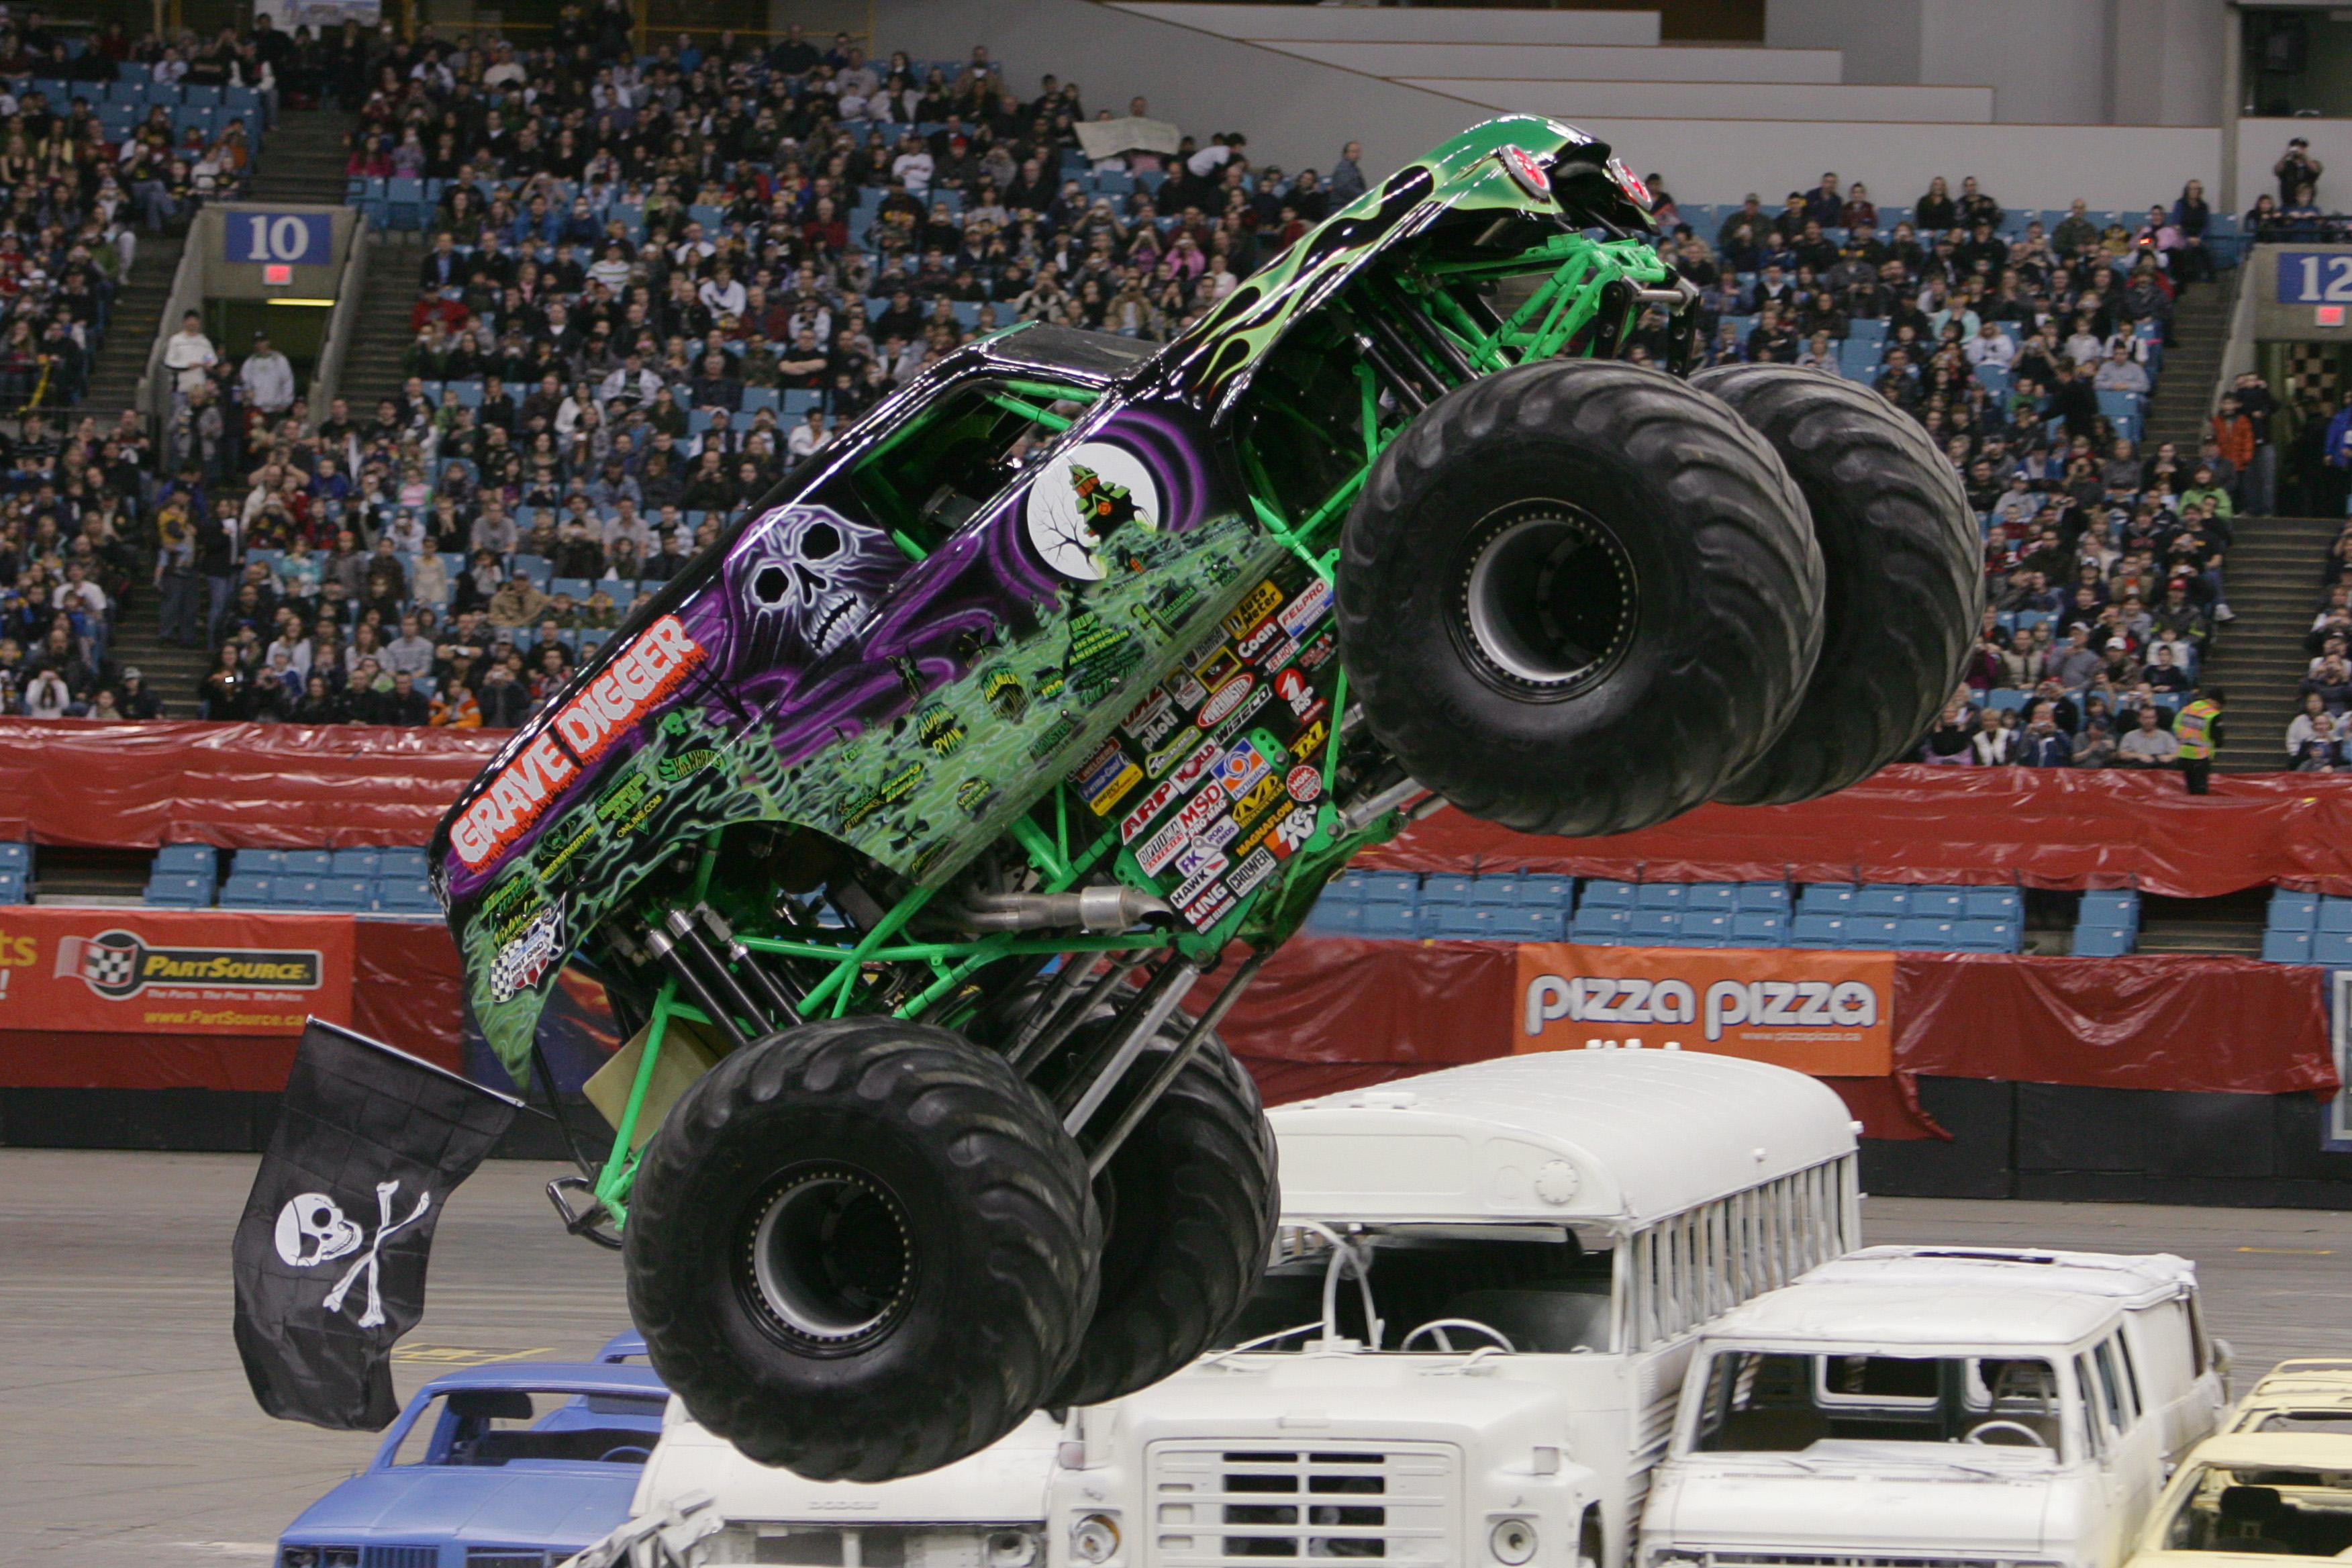 Grave digger monster truck 4x4 race racing monster truck hh wallpaper 3504x2336 136865 - Grave digger wallpaper ...